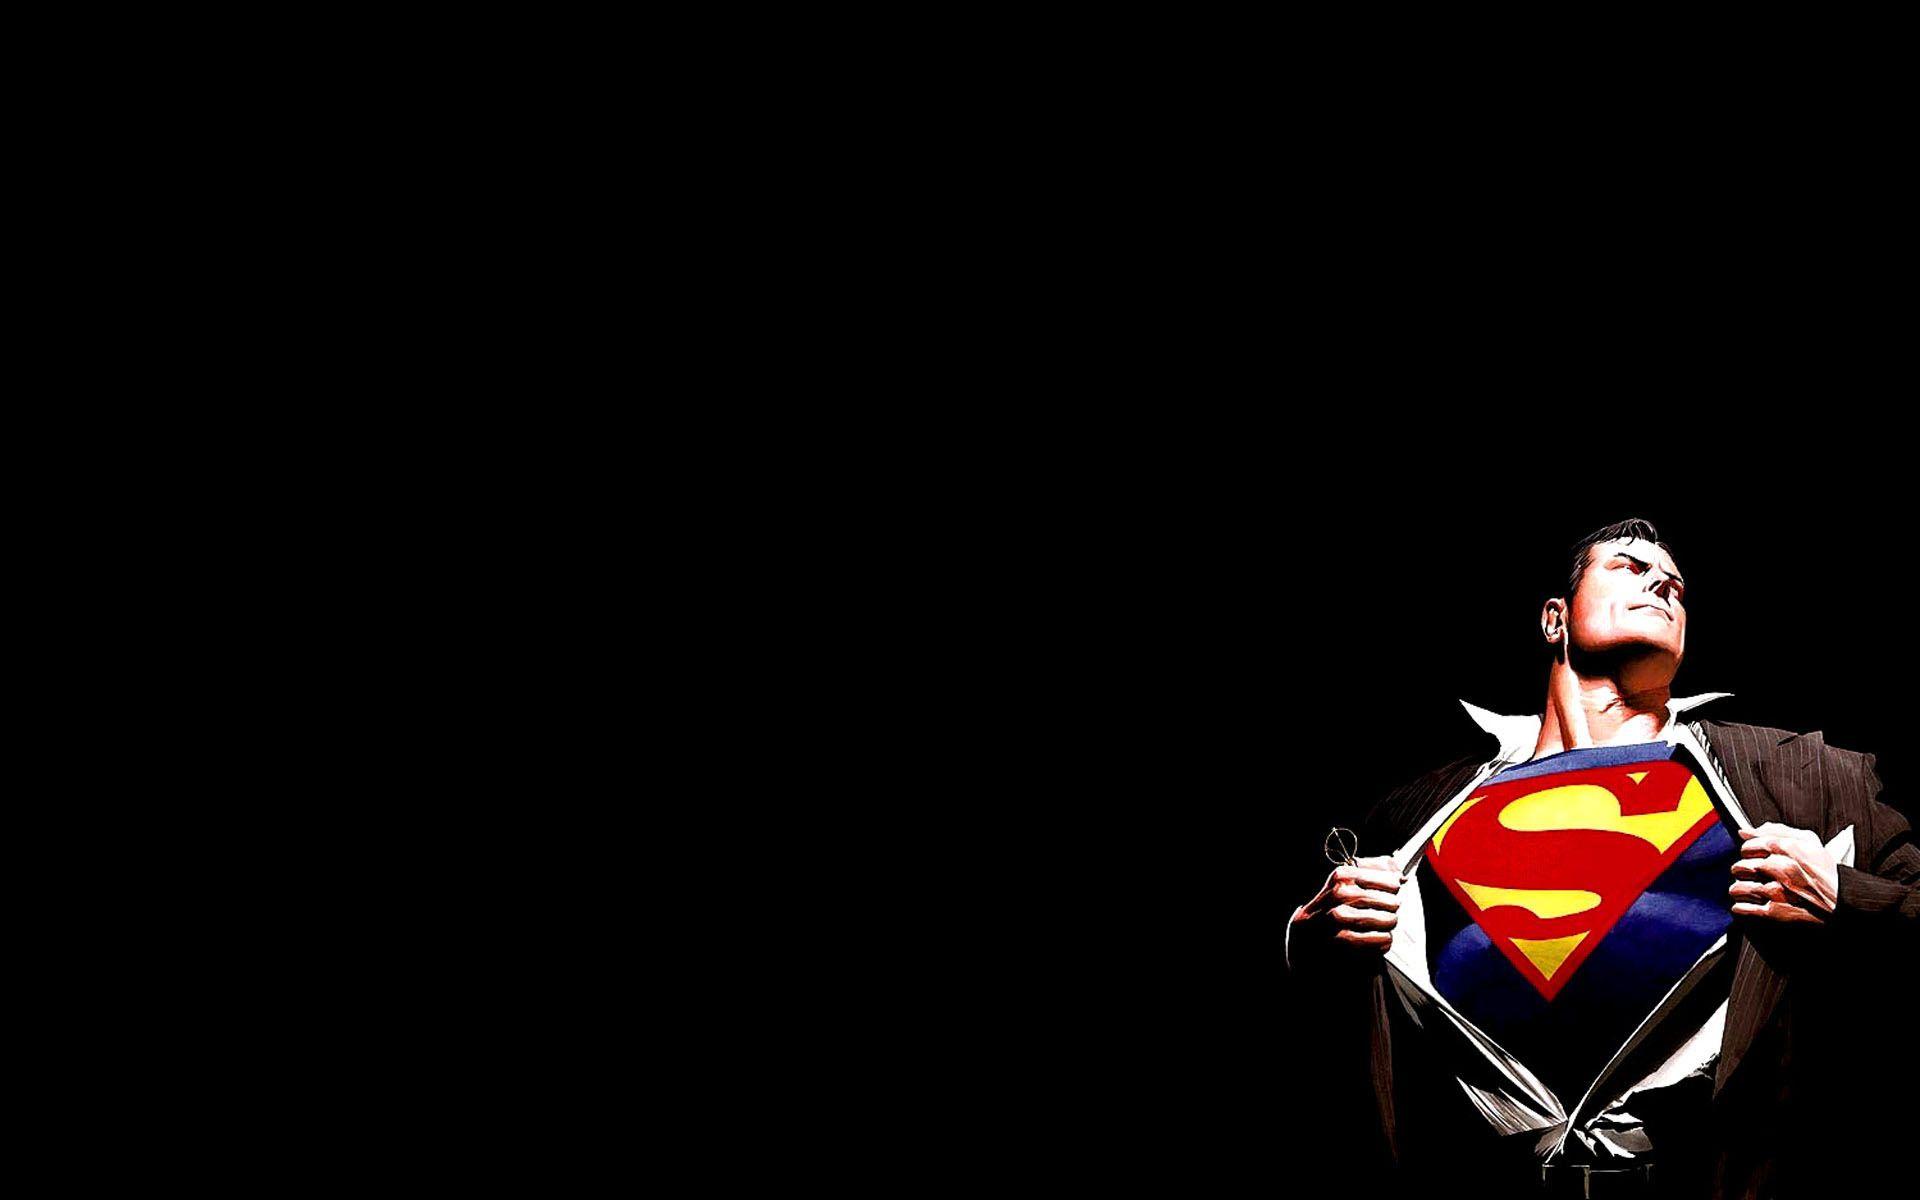 Superman Hd Wallpapers Backgrounds Wallpaper 1920x1200